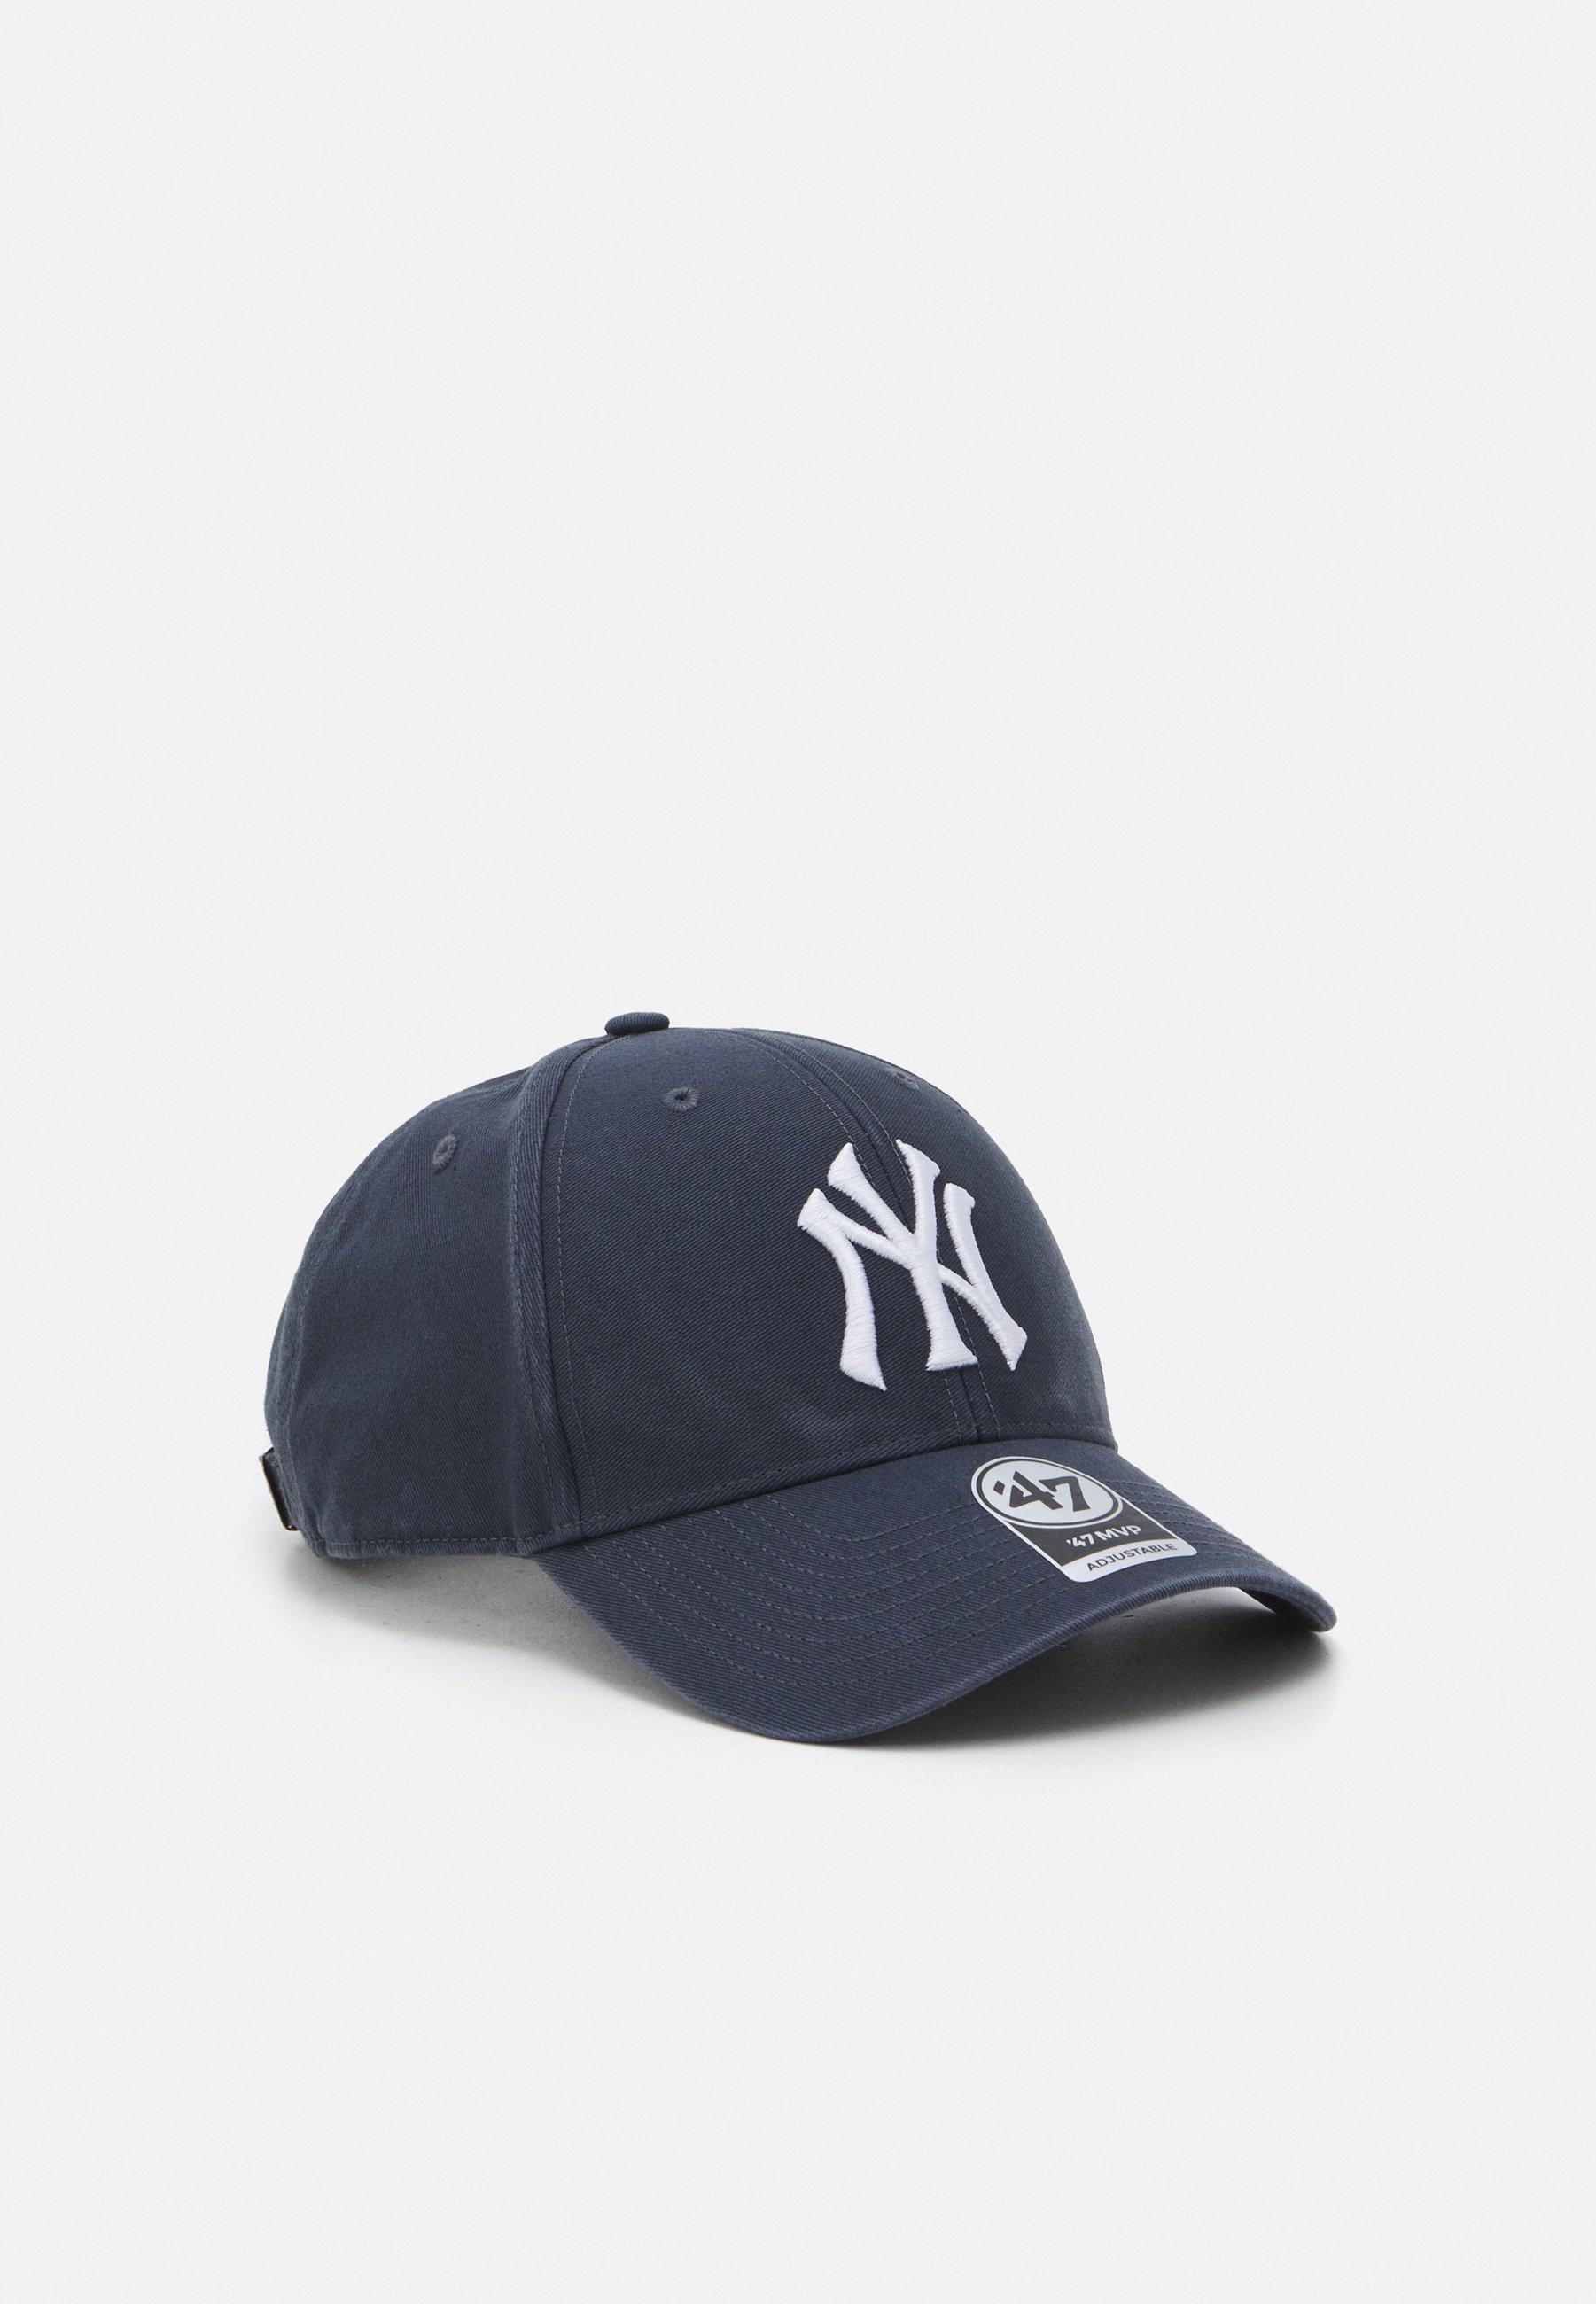 Hombre MLB NEW YORK YANKEES LEGEND '47 UNISEX - Gorra